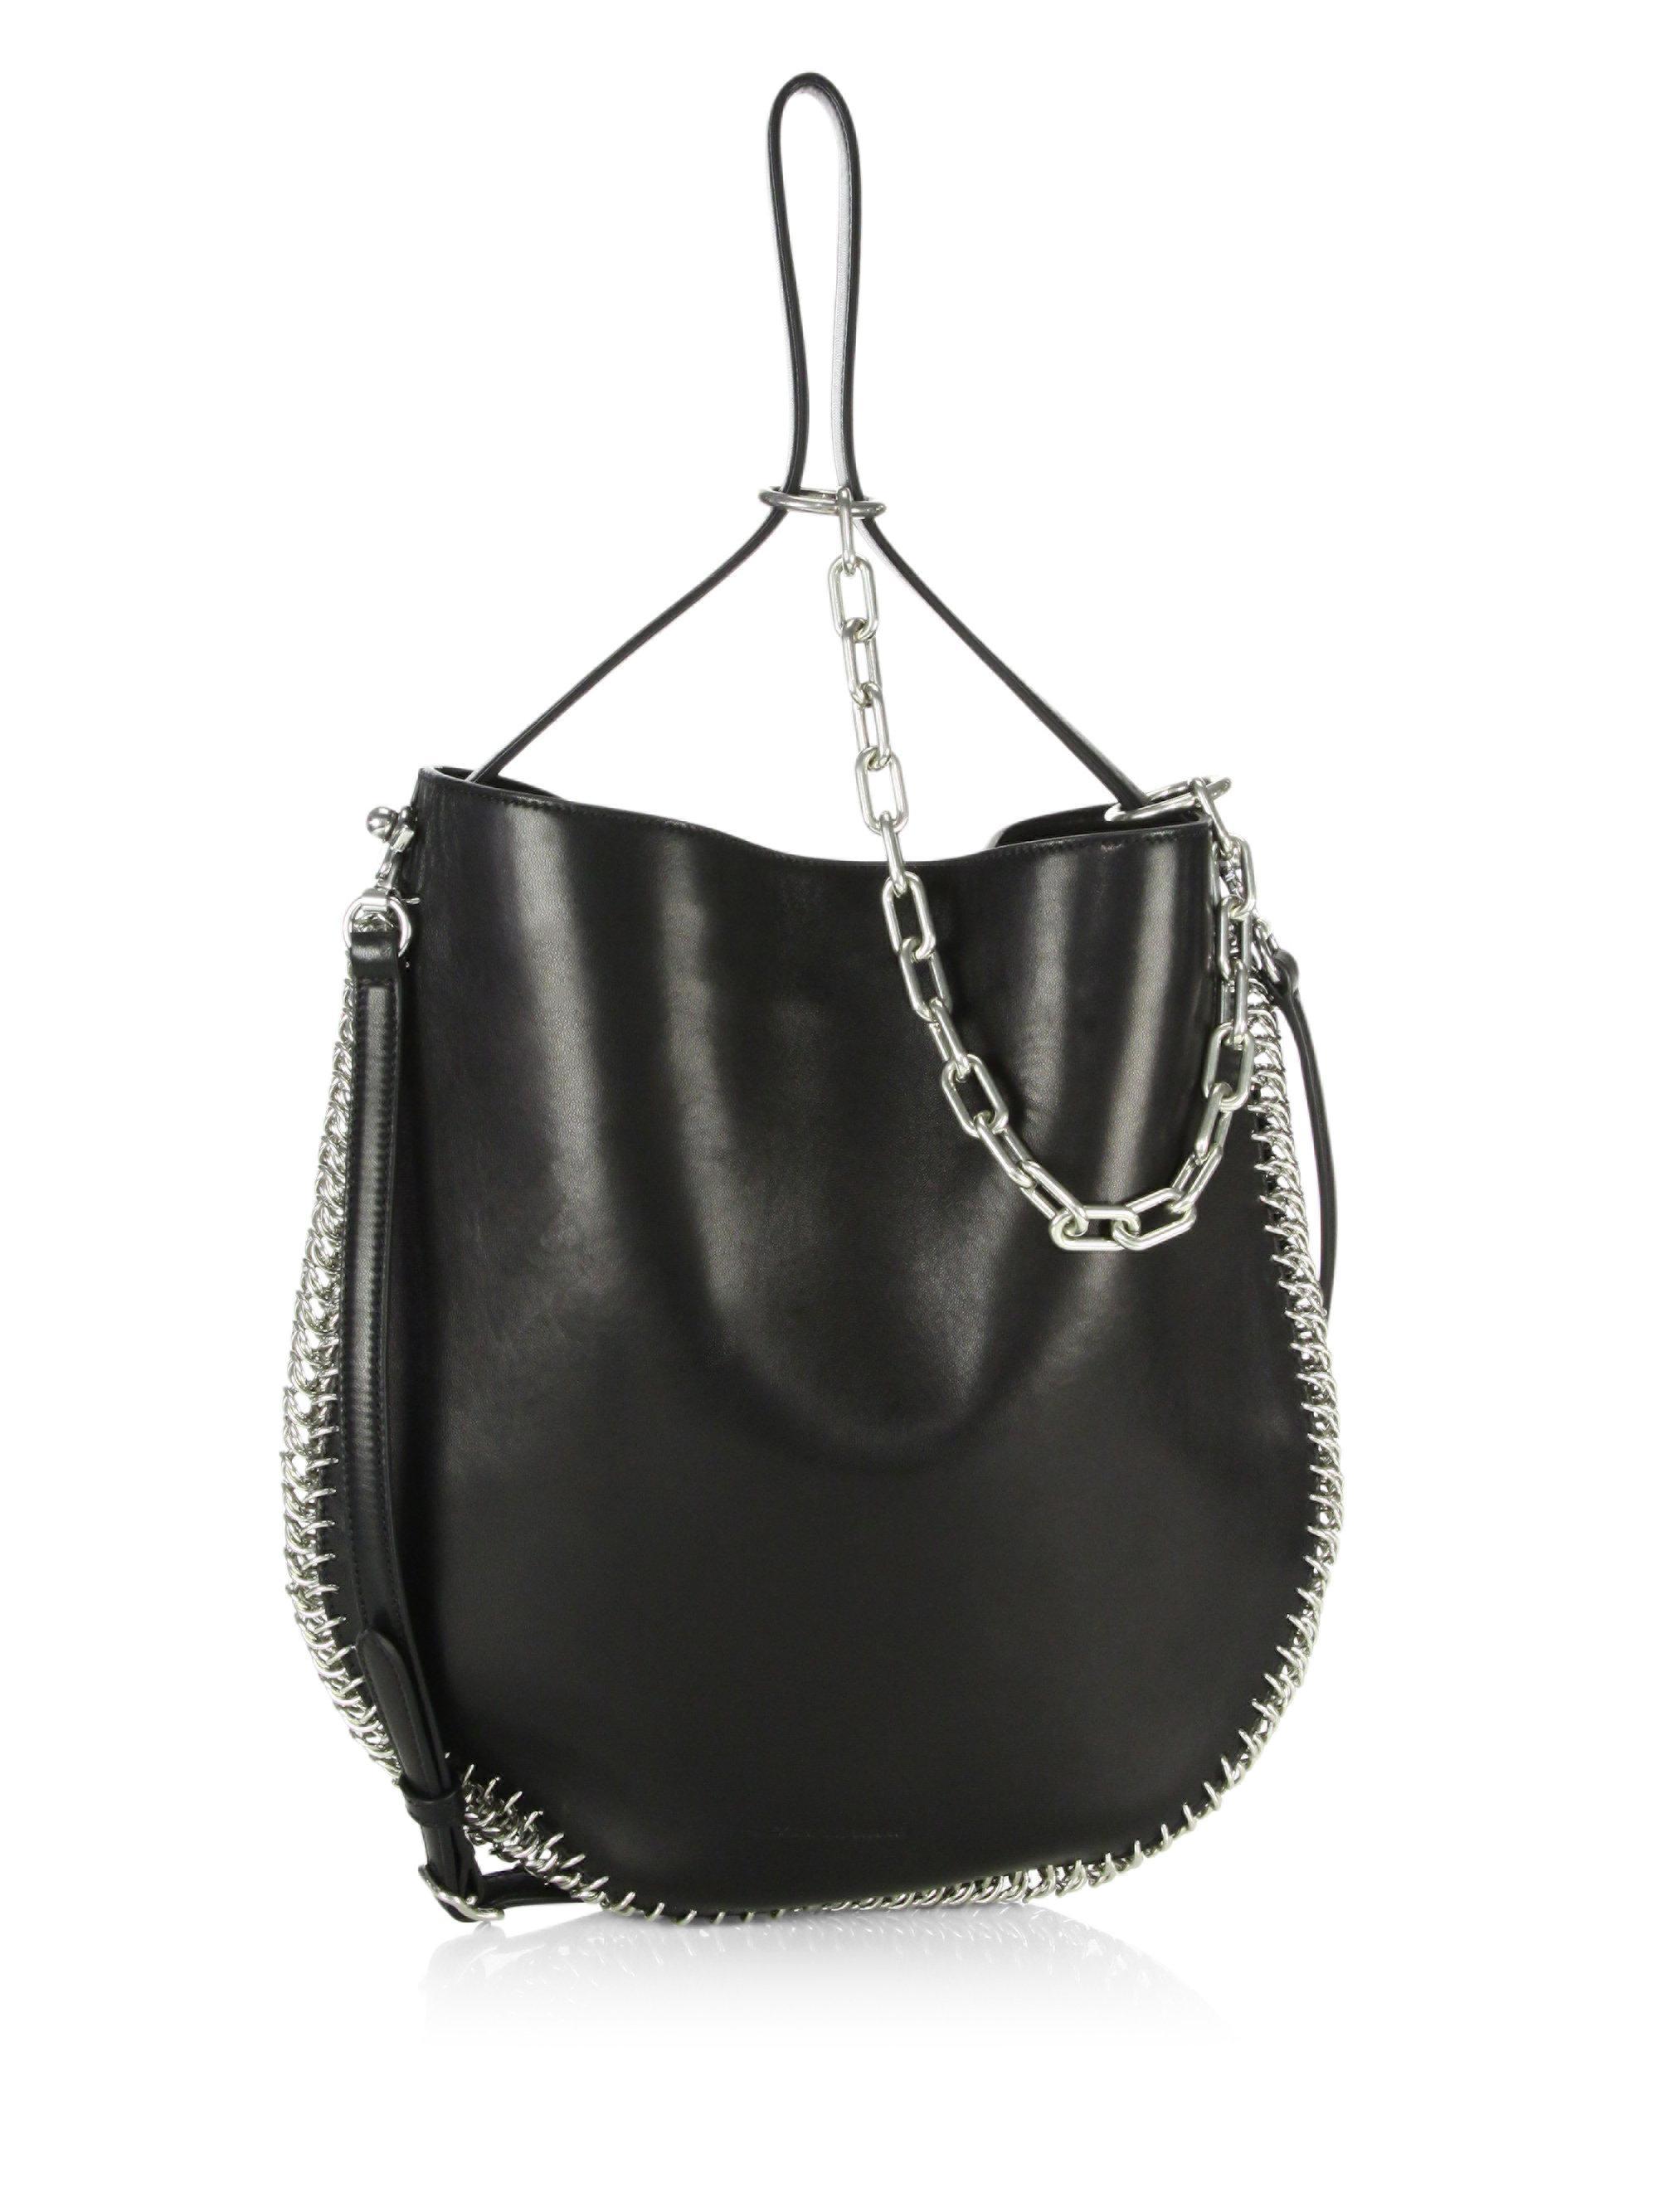 Lyst - Alexander Wang Roxy Hobo Bag in Black 439dbb51610fc